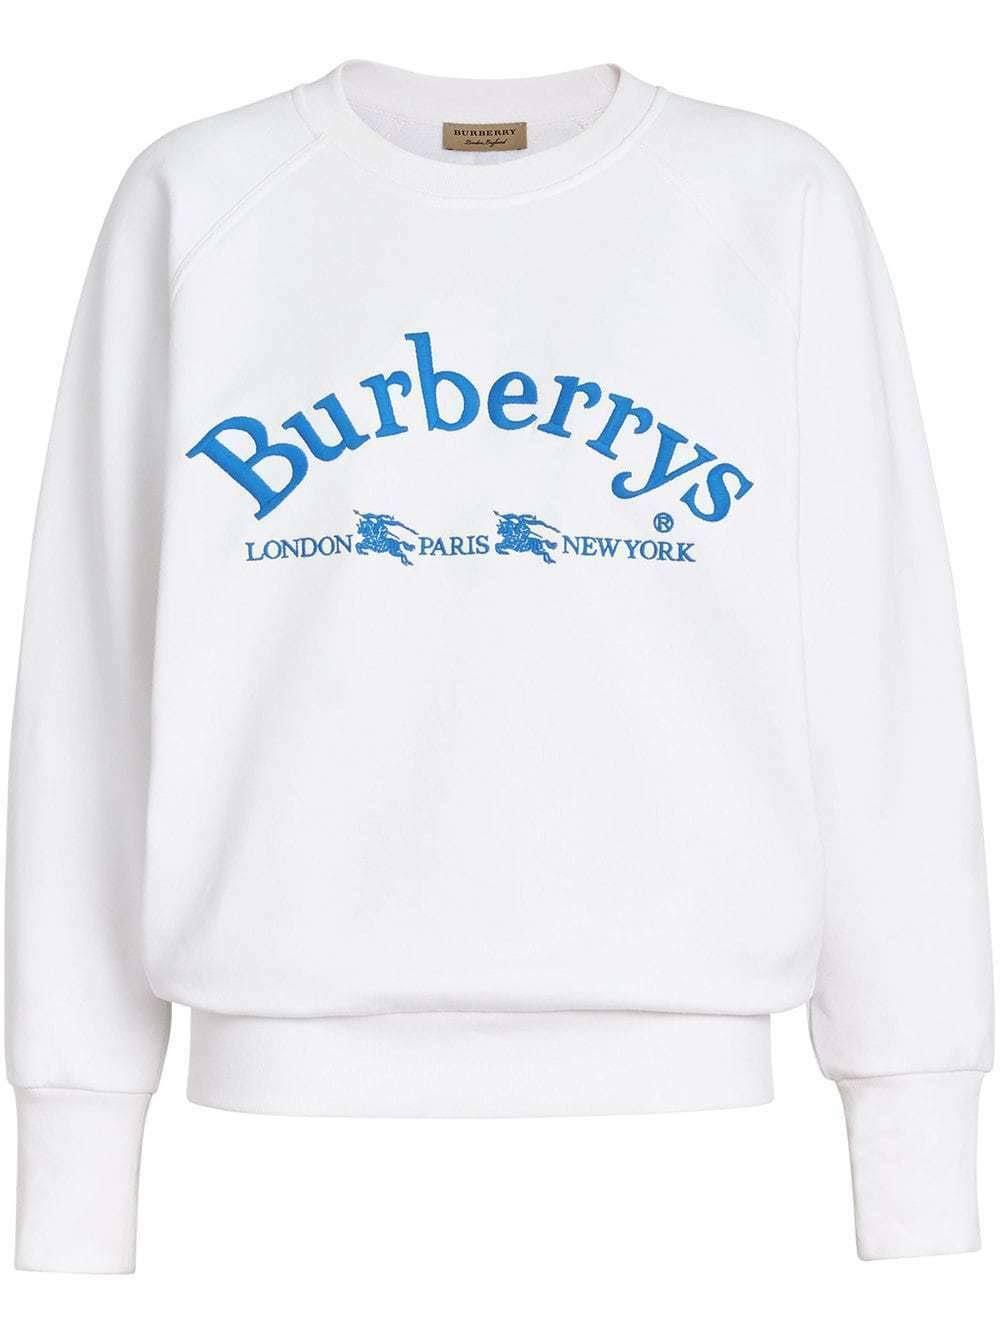 De Mujer Blanco Burberry Sweater Retro Tamaño Battarni Xs Logo Para aHxwtTxPq